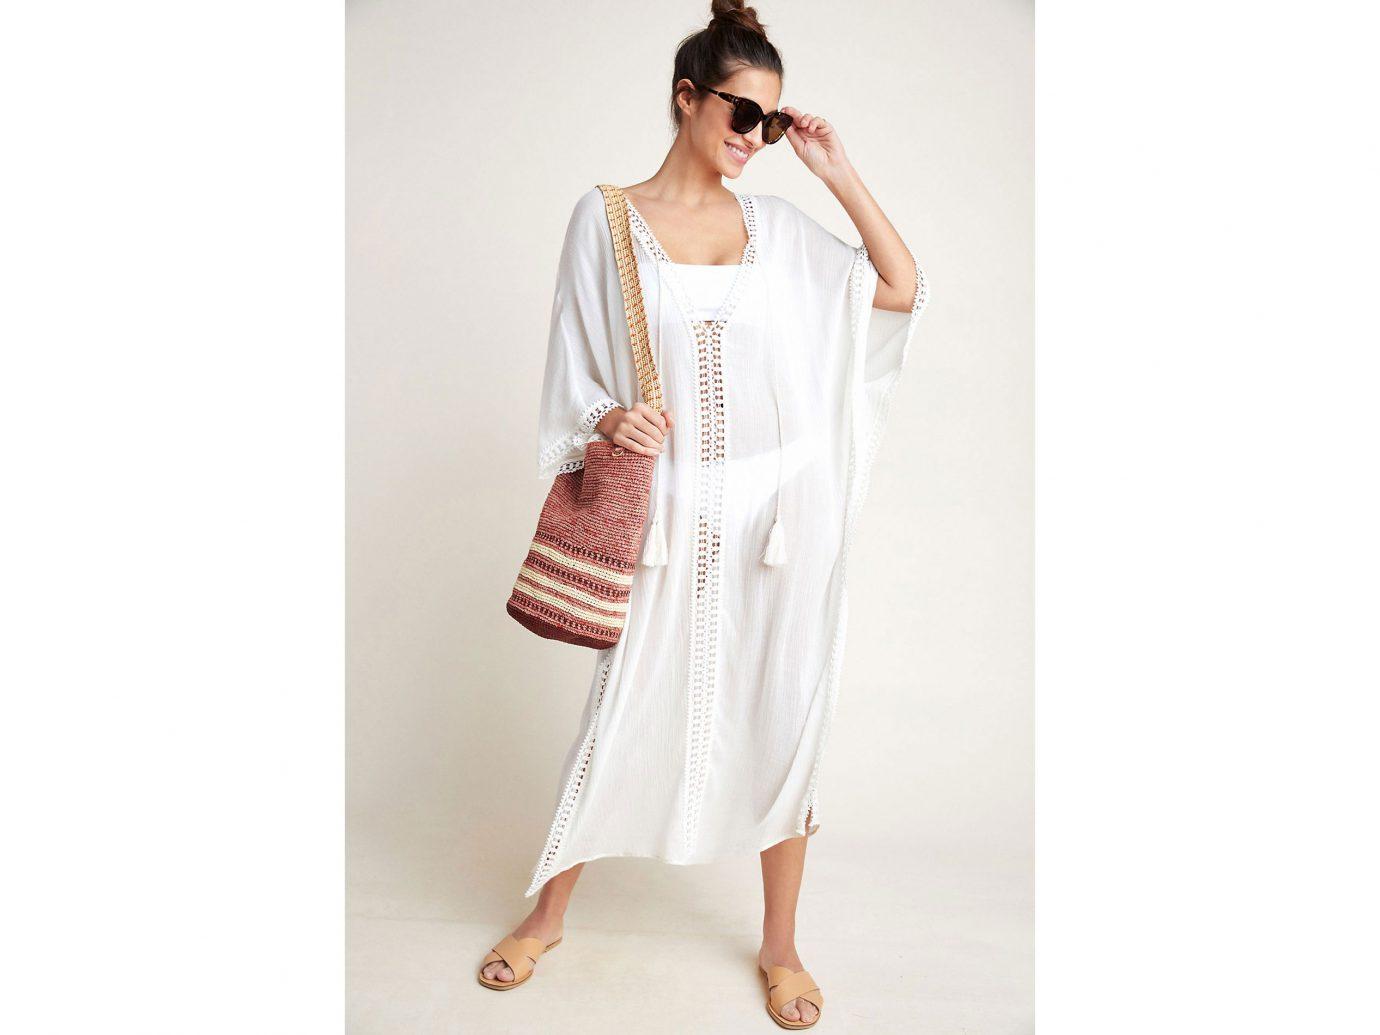 Eberjey Summer of Love Cover-Up Dress